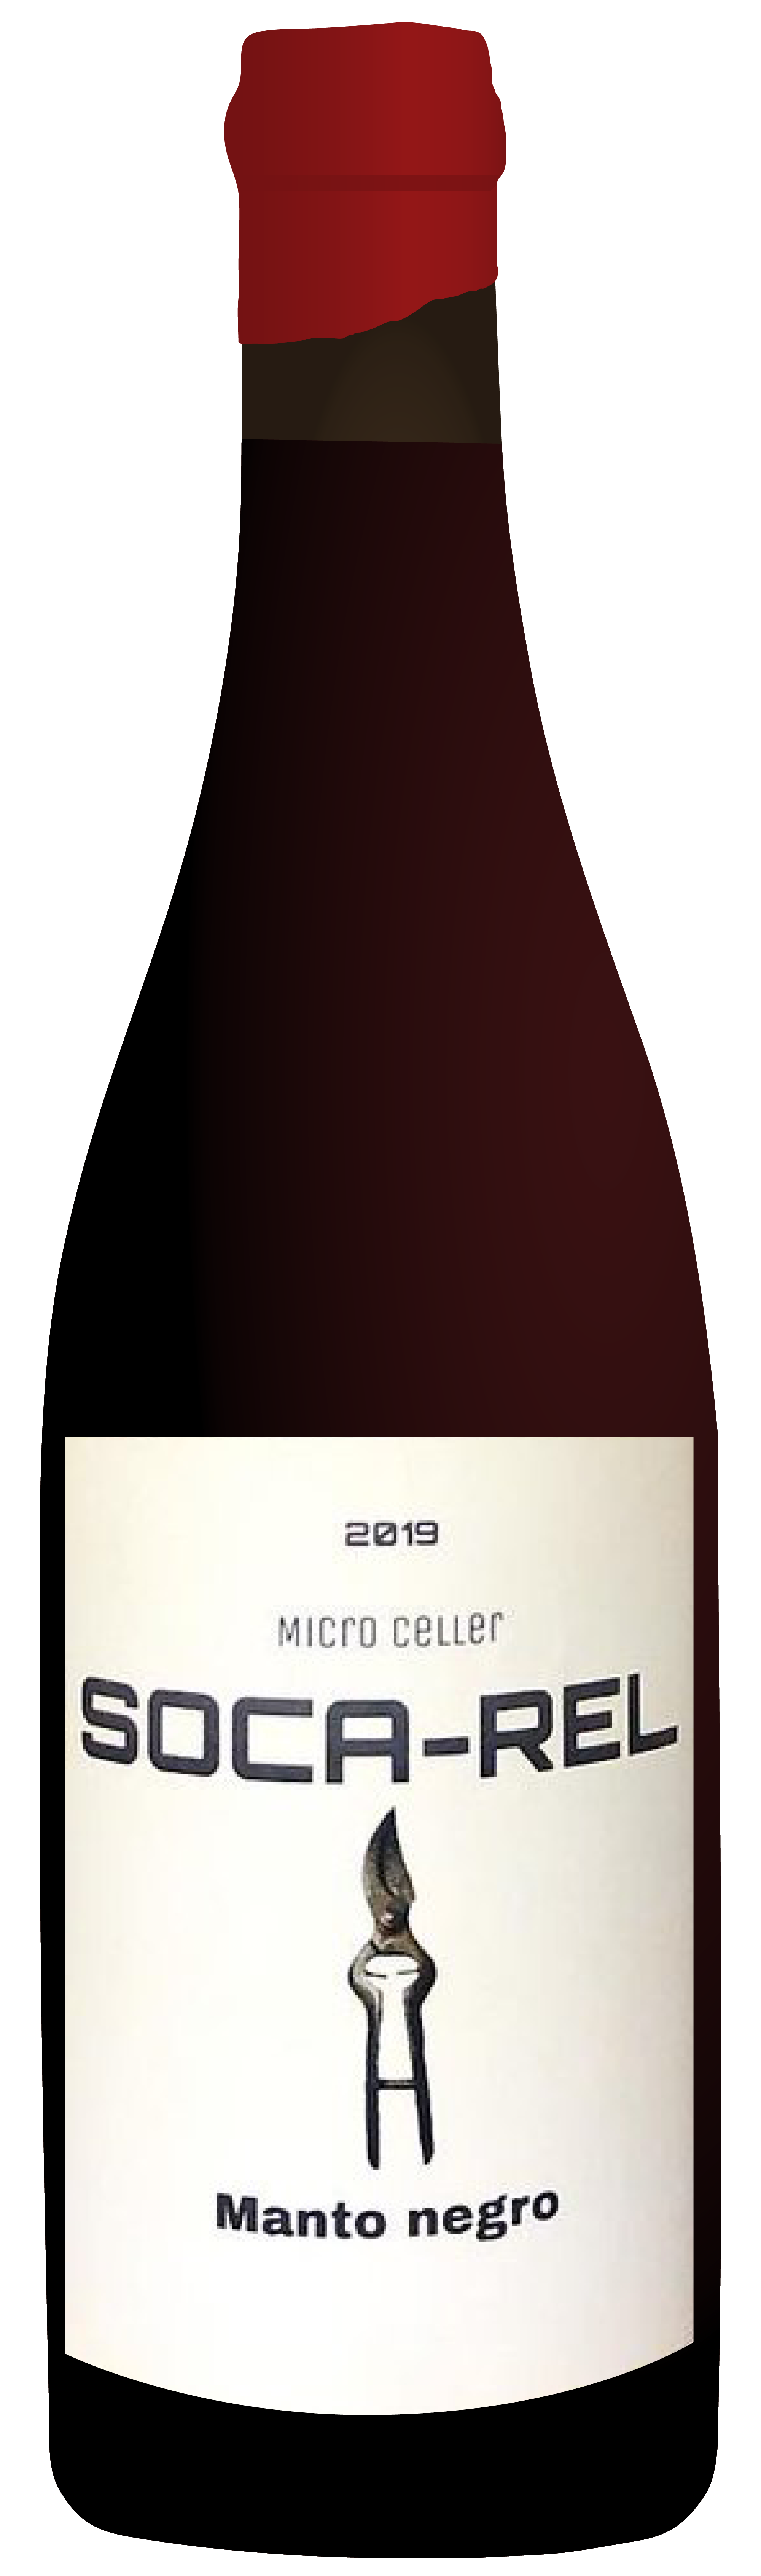 the natural wine company club november 2020 spain soca rel manto negro